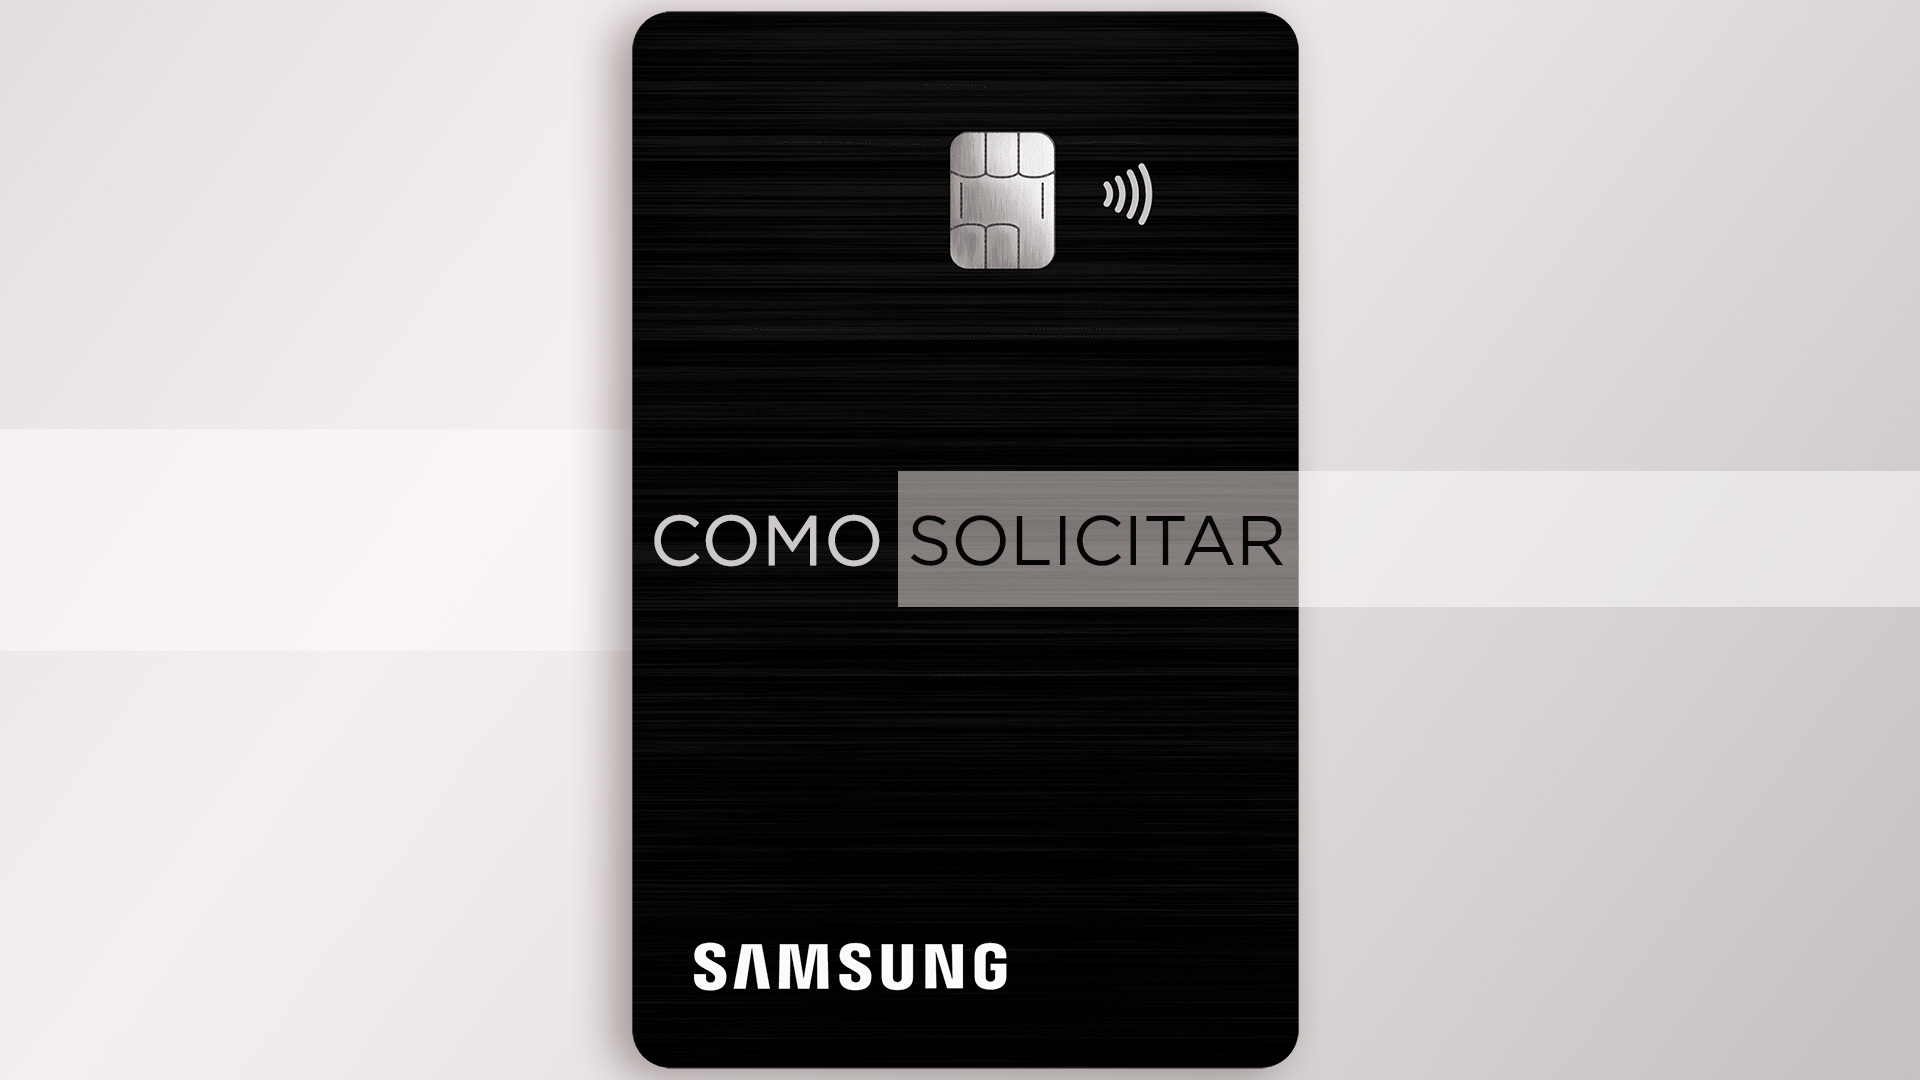 como solicitar samsung itaucard